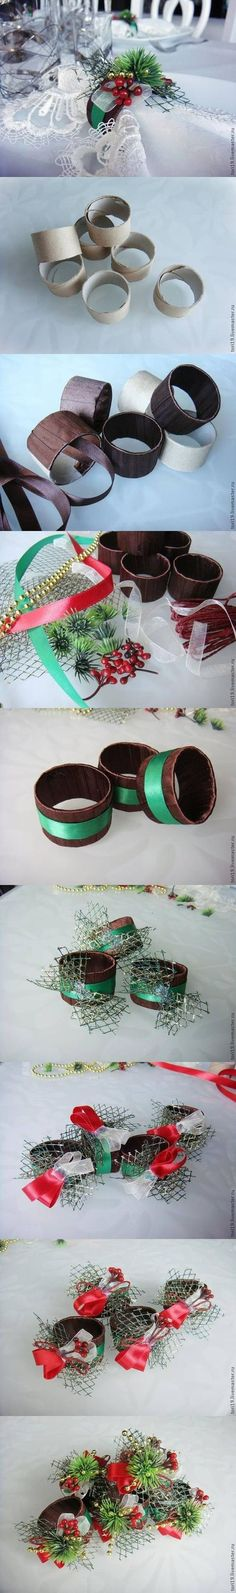 DIY Toilet Roll Custom Napkin Rings DIY Projects /...